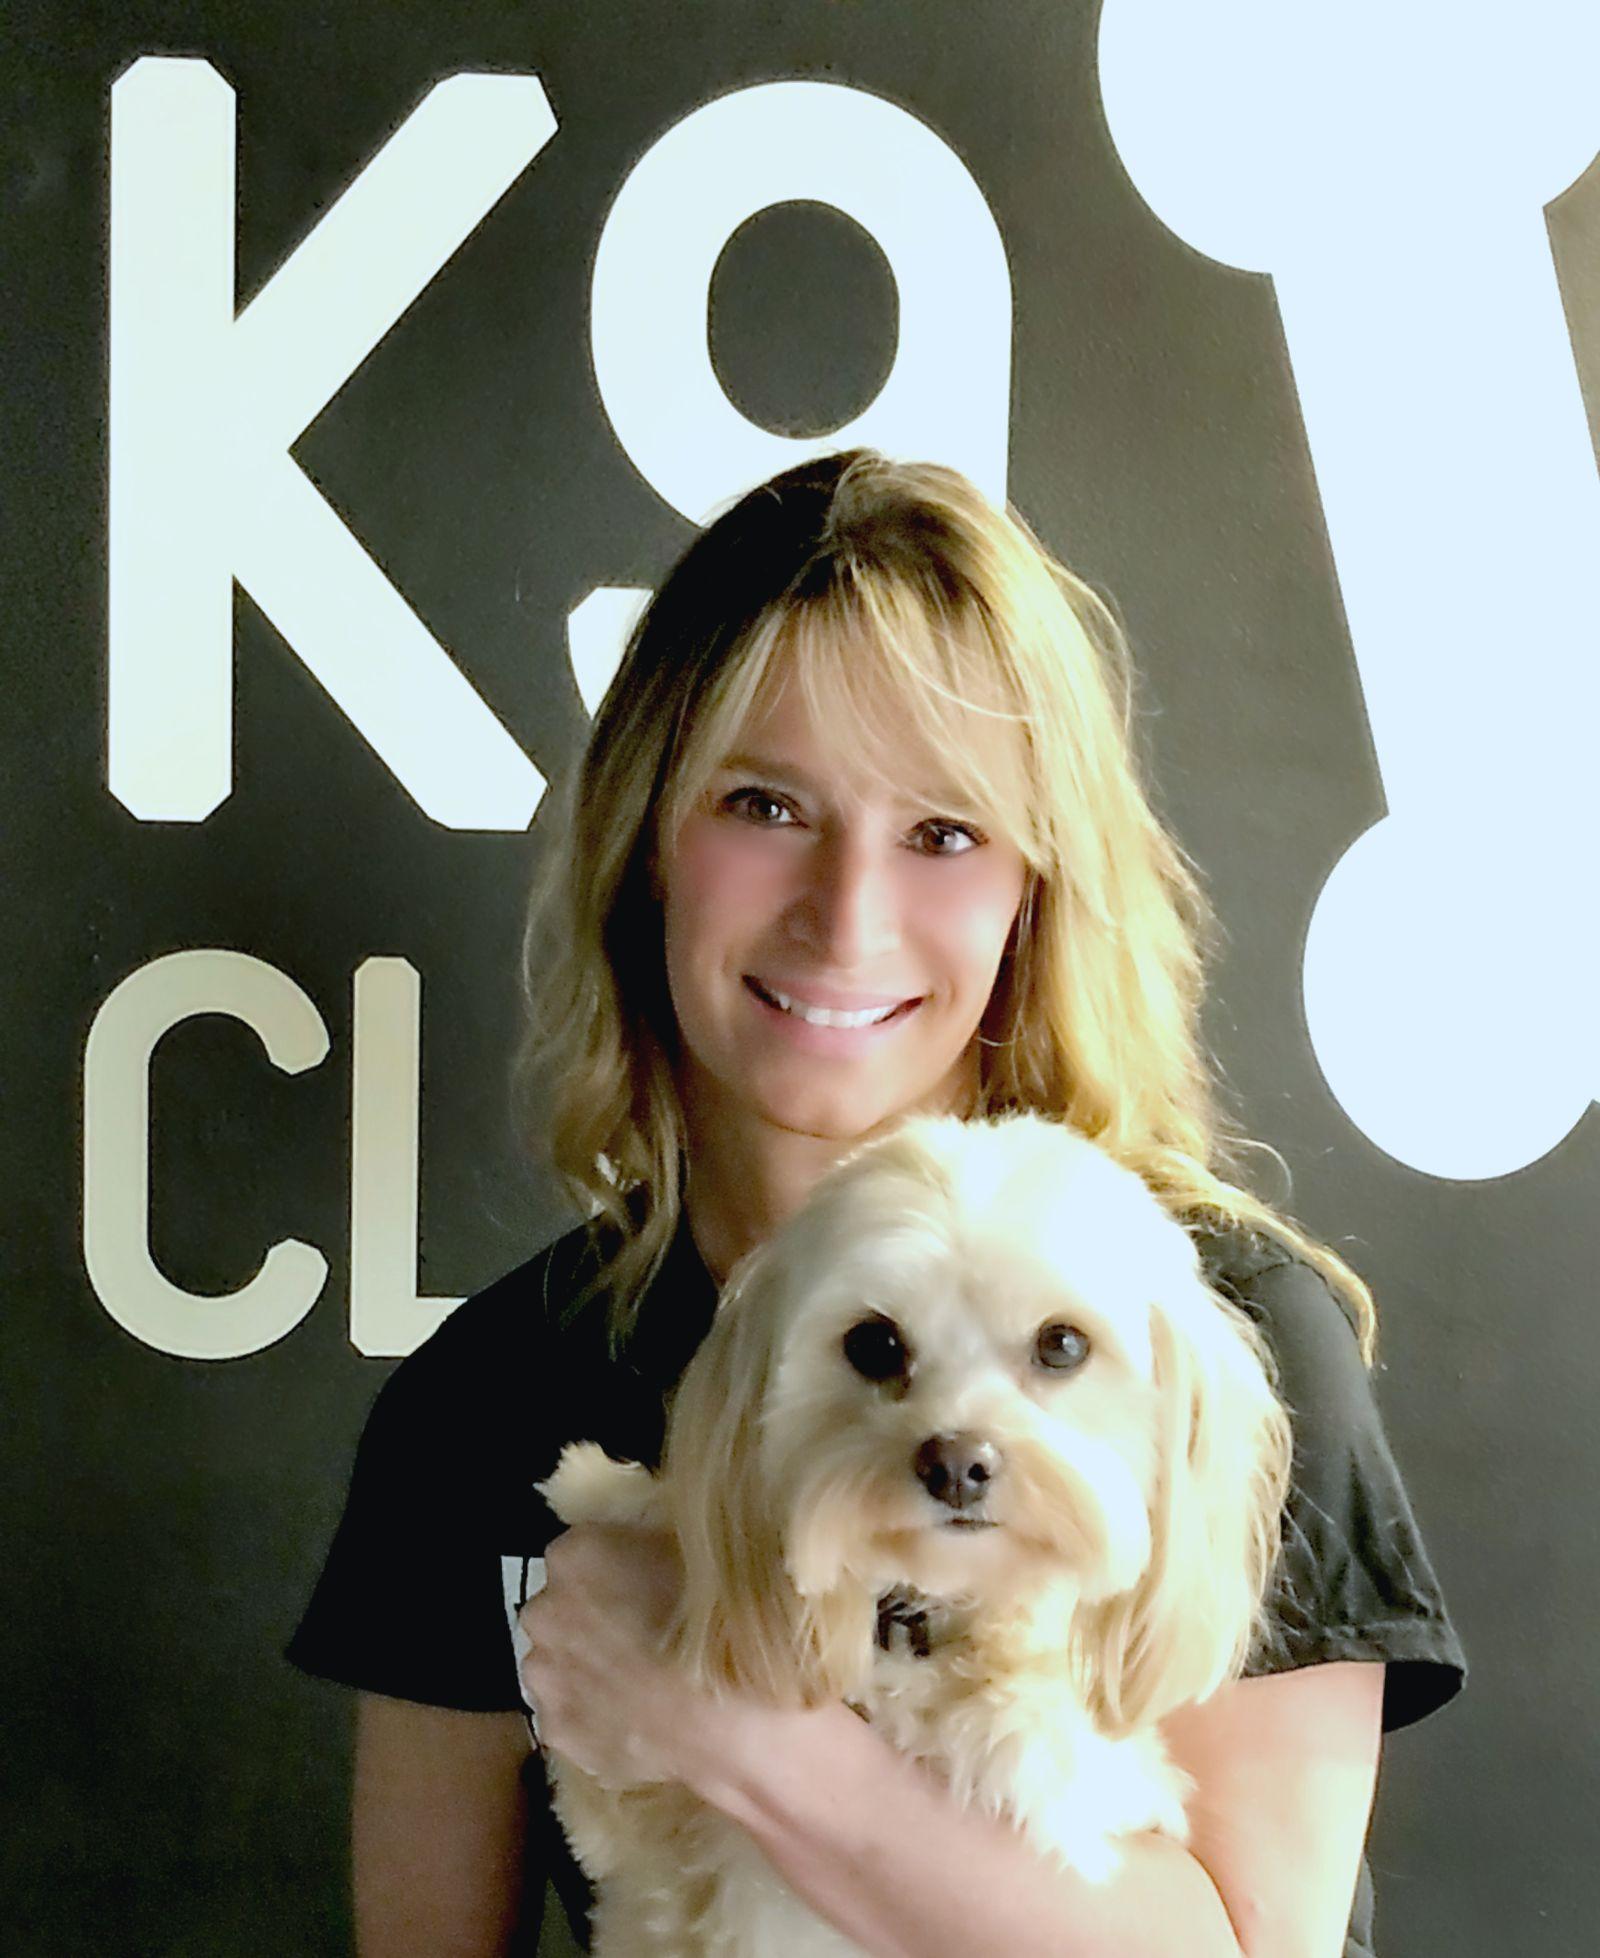 K-9 Fitness Center and Spa owner, Kimberly Hamilton